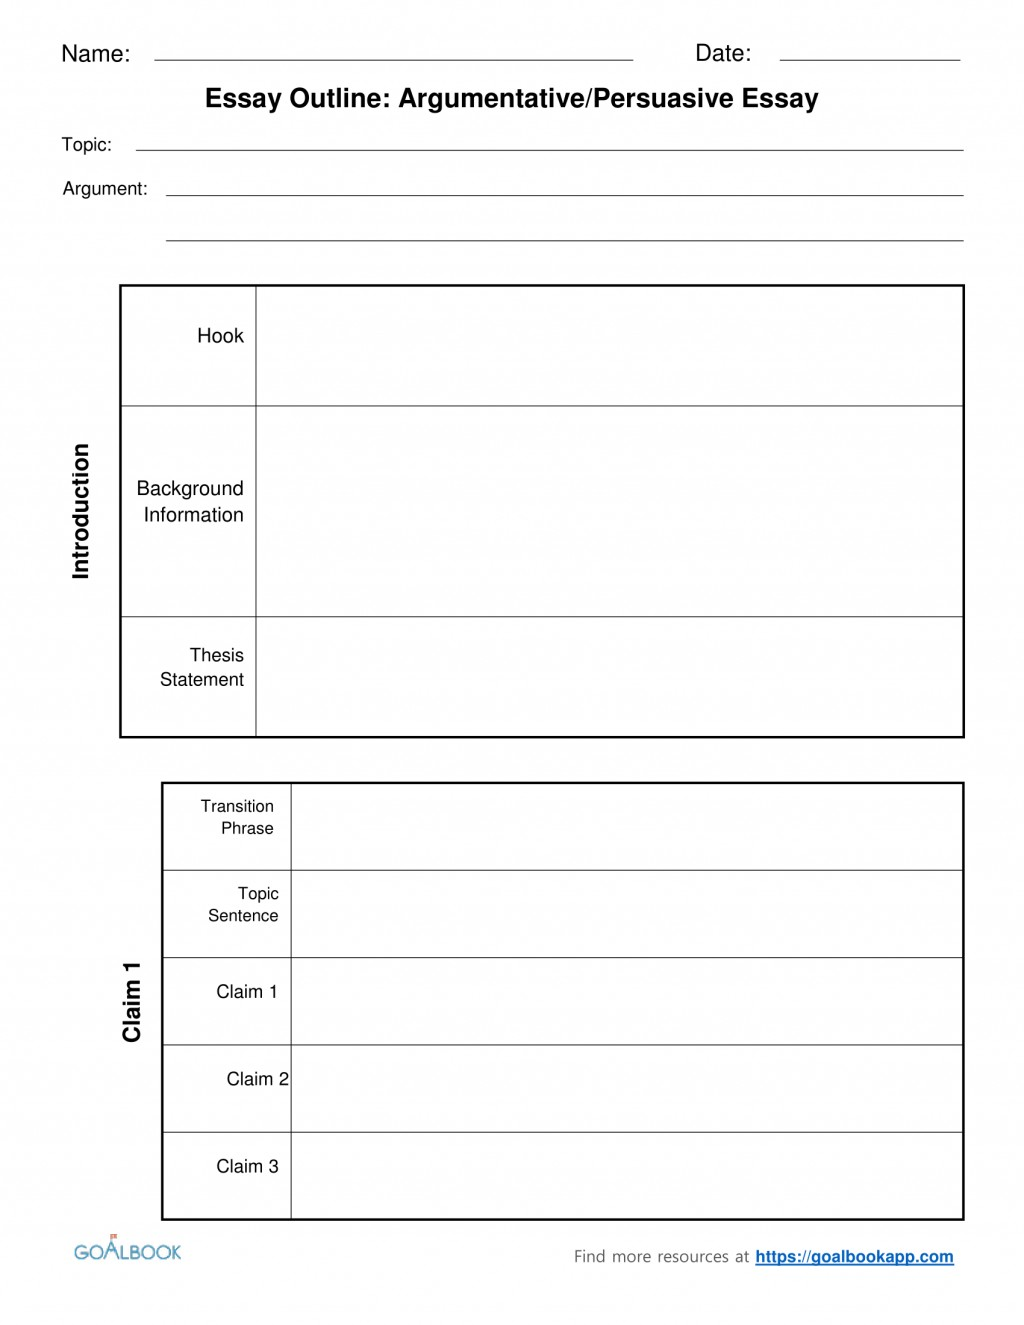 010 2argumentative Persuasiveessayoutlinechunked Argumentative Essay Graphic Organizer Pdf Impressive Persuasive Middle School Large